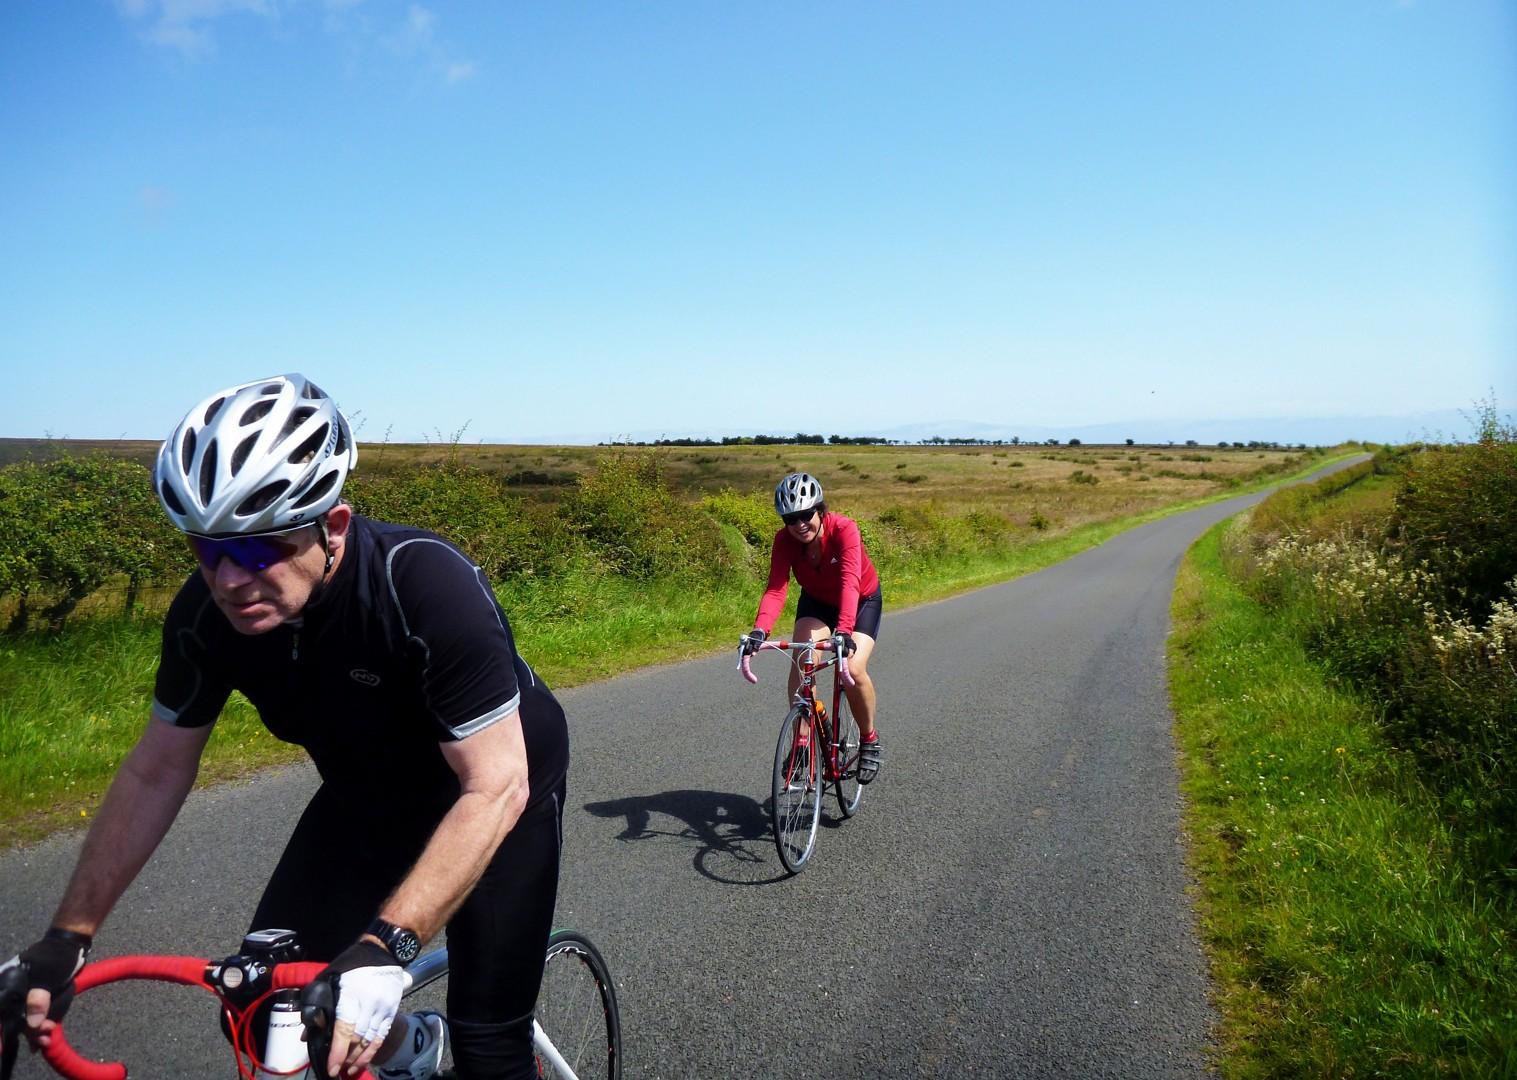 group-cycling-weekend.jpg - UK - Northumberland - Road Cycling